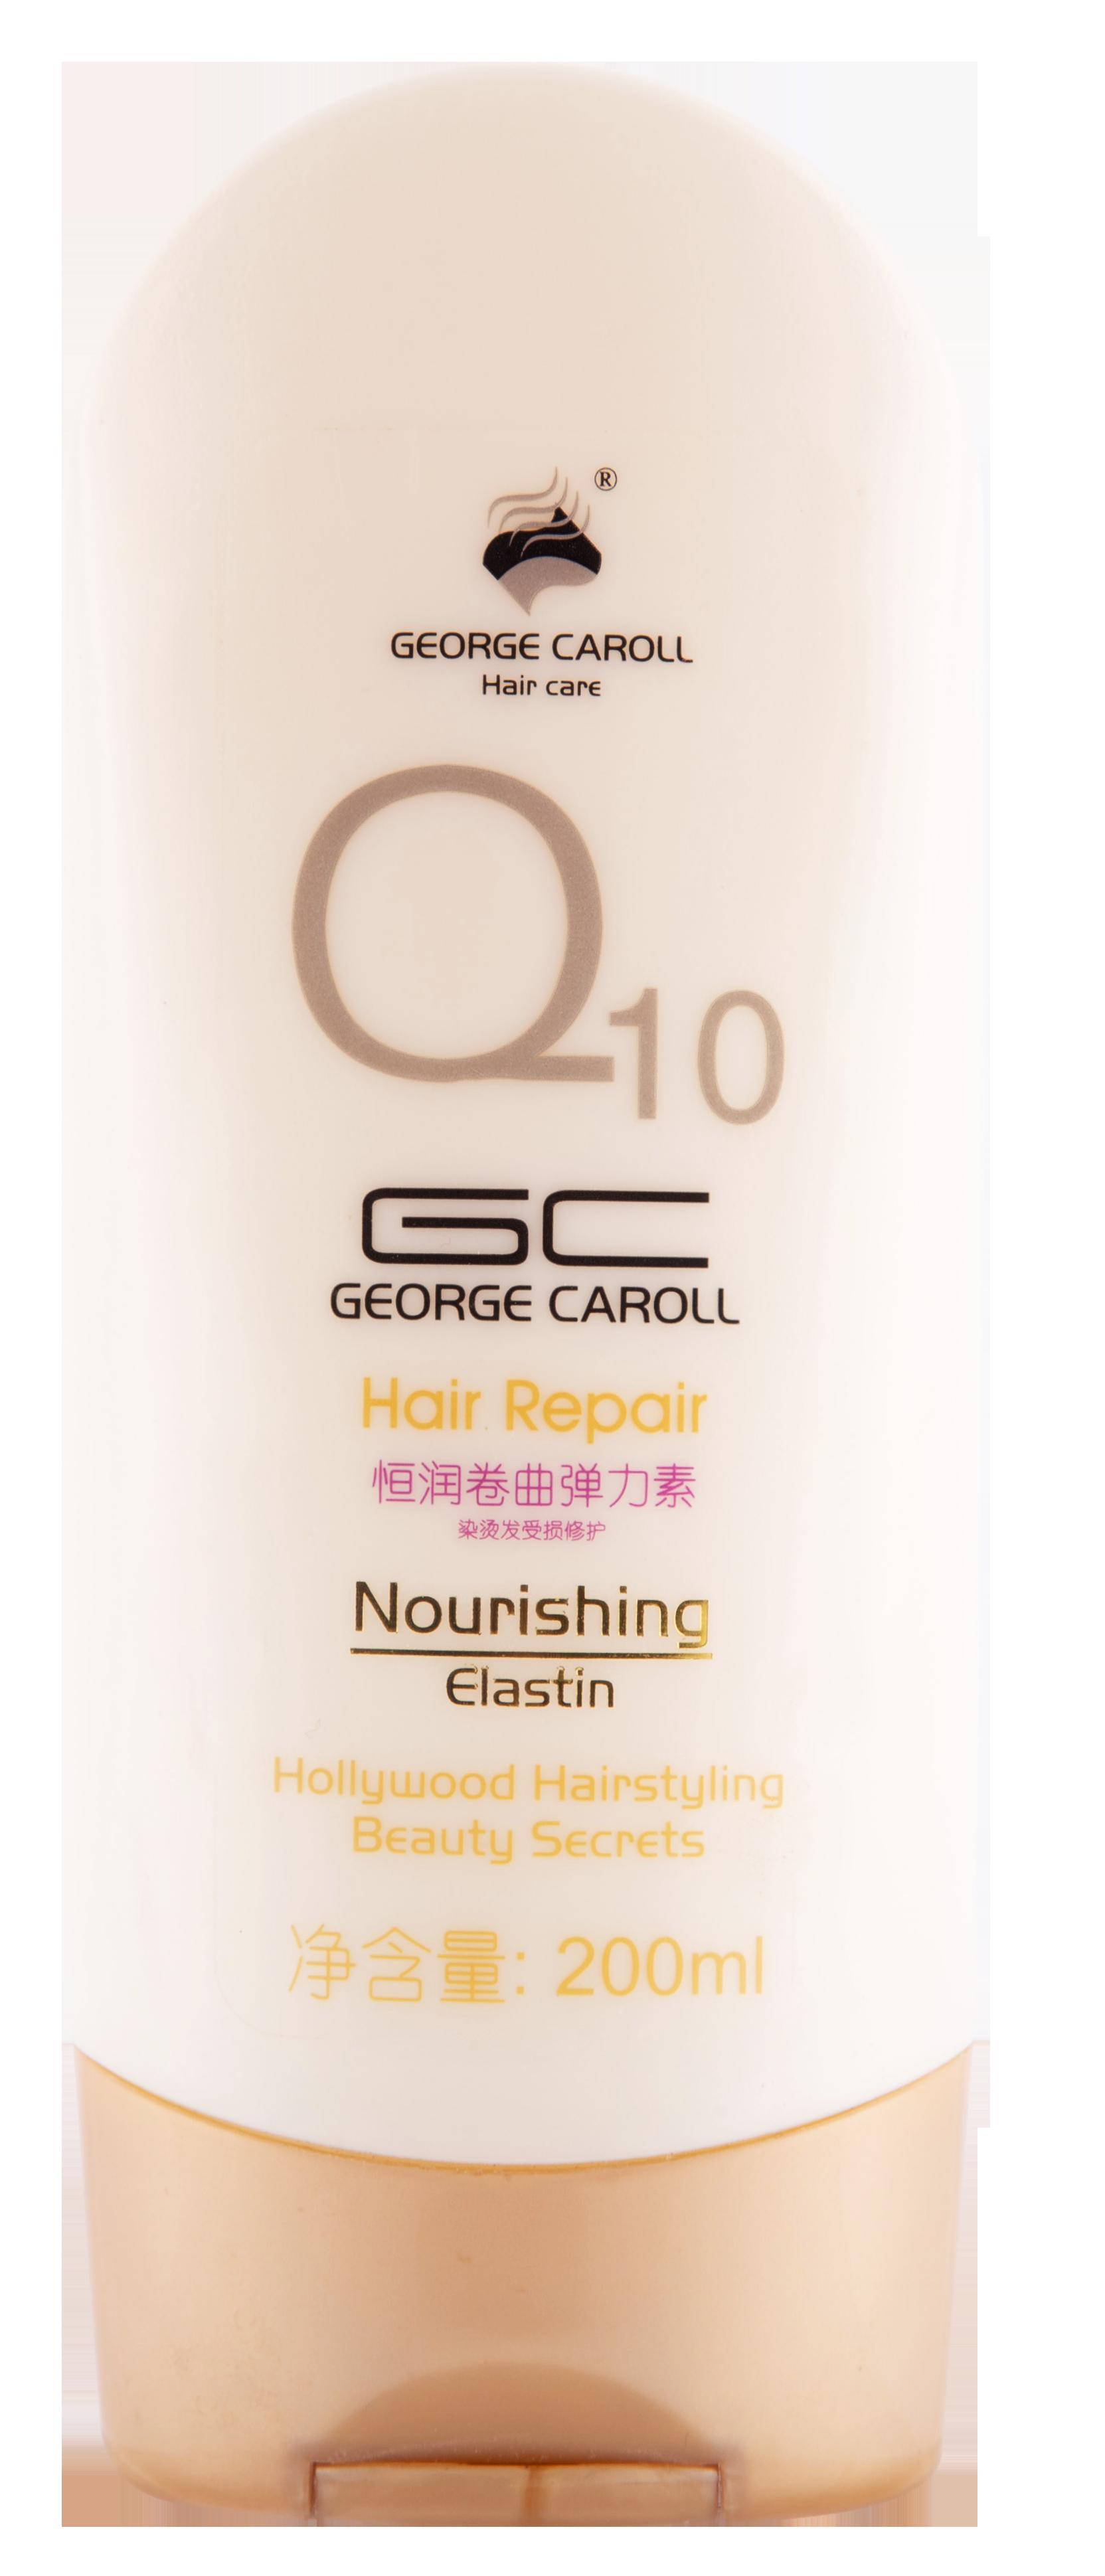 Elastina de Nouishing, juego de cabello, para cabello rizado, CUIDADO HIDRATANTE del cabello, crema rizadora de mejora de larga duración, reparación del cabello